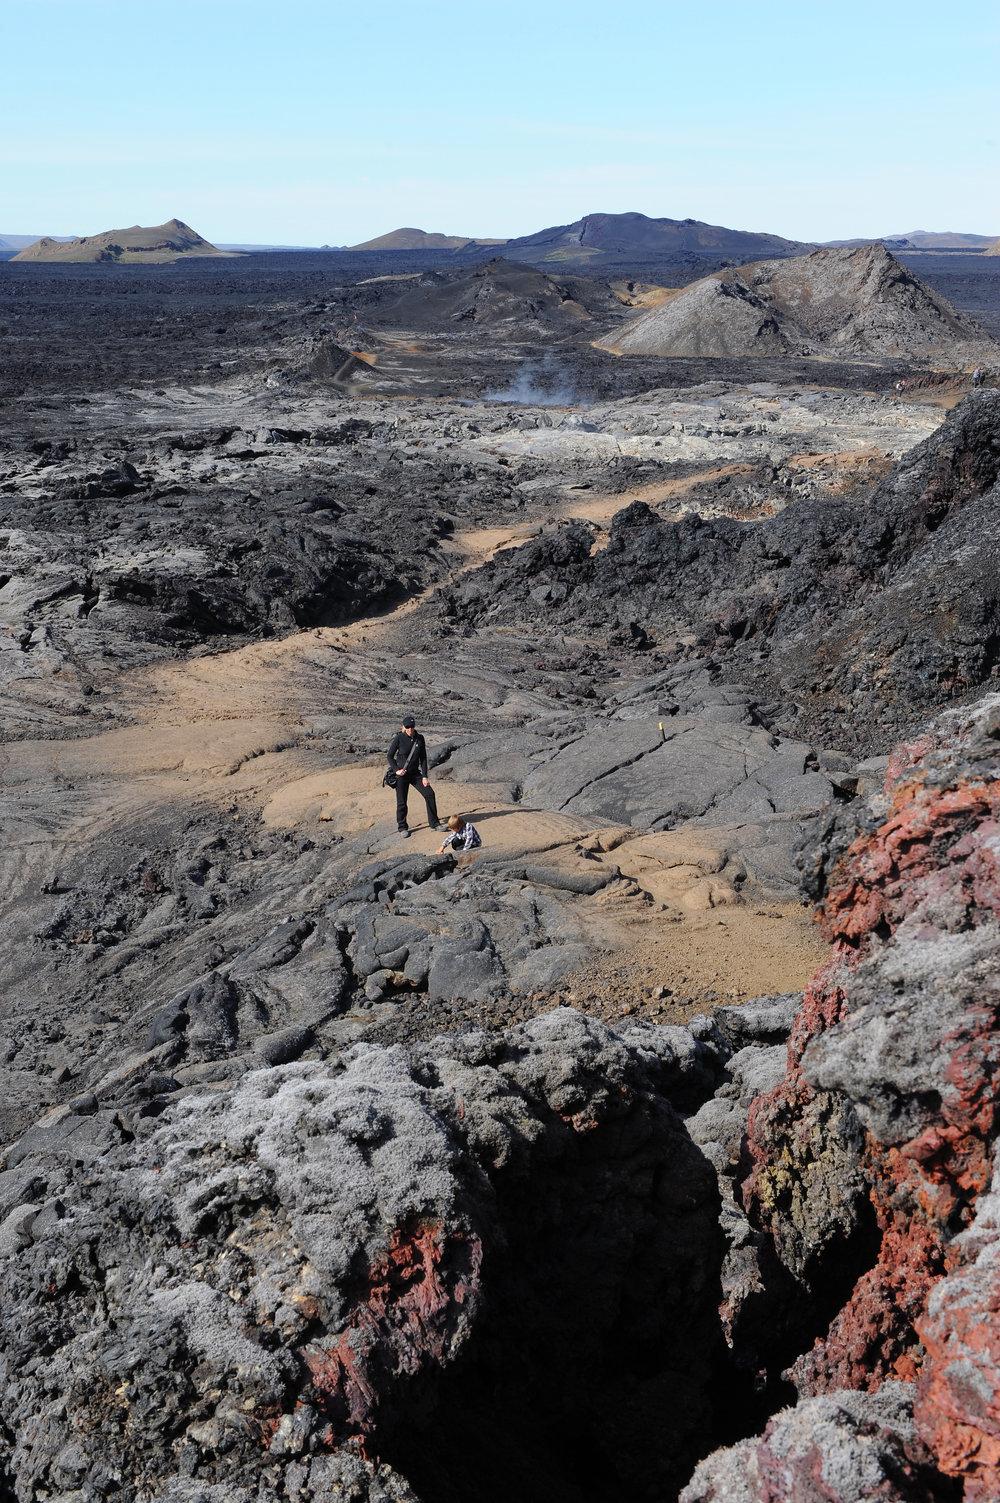 Myvathan, Islanti, tulivuori, matkablogi